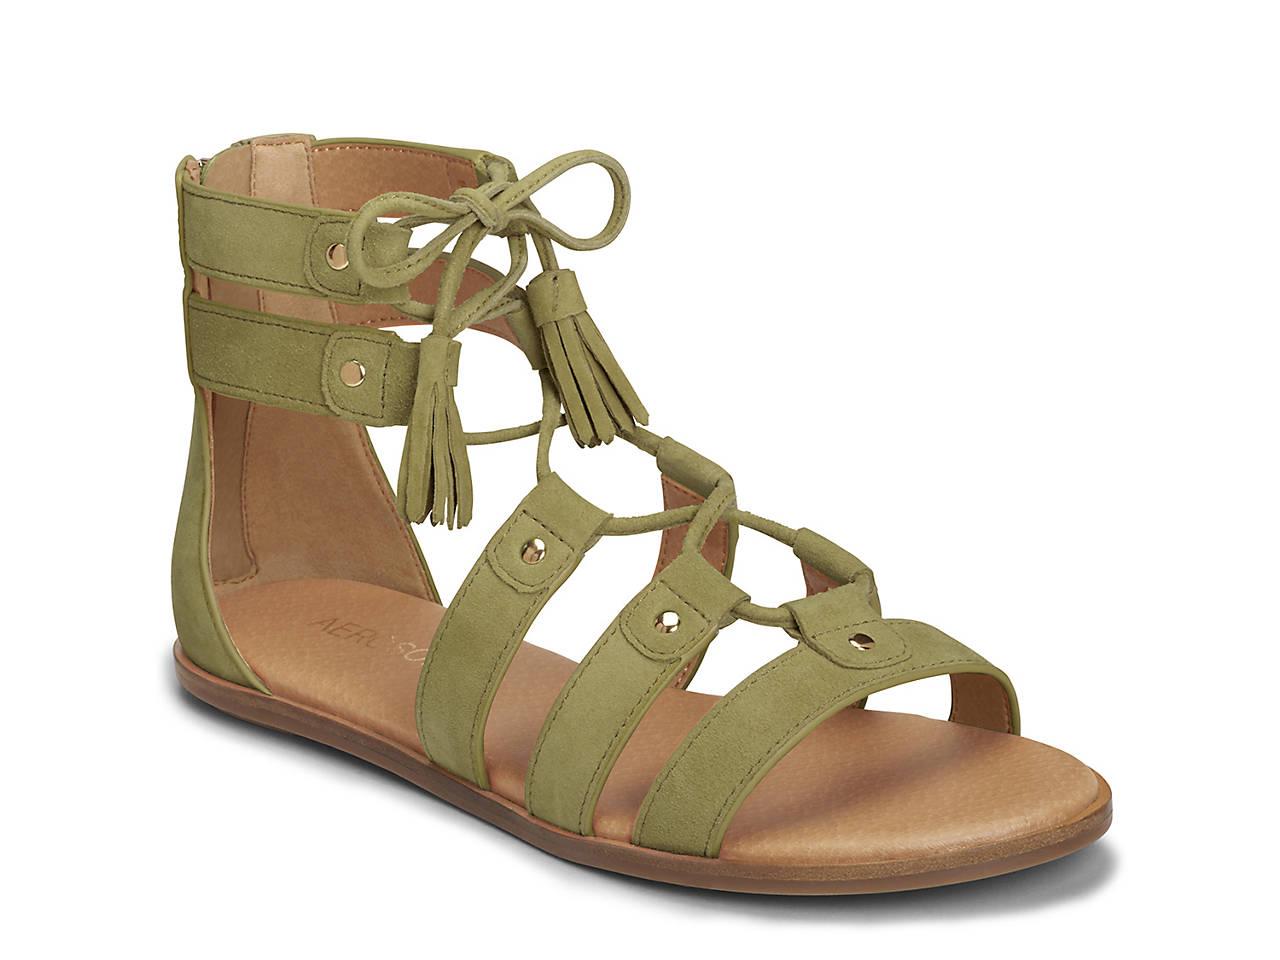 d0ef0ab77a43 Aerosoles Lottery Gladiator Sandal Women s Shoes